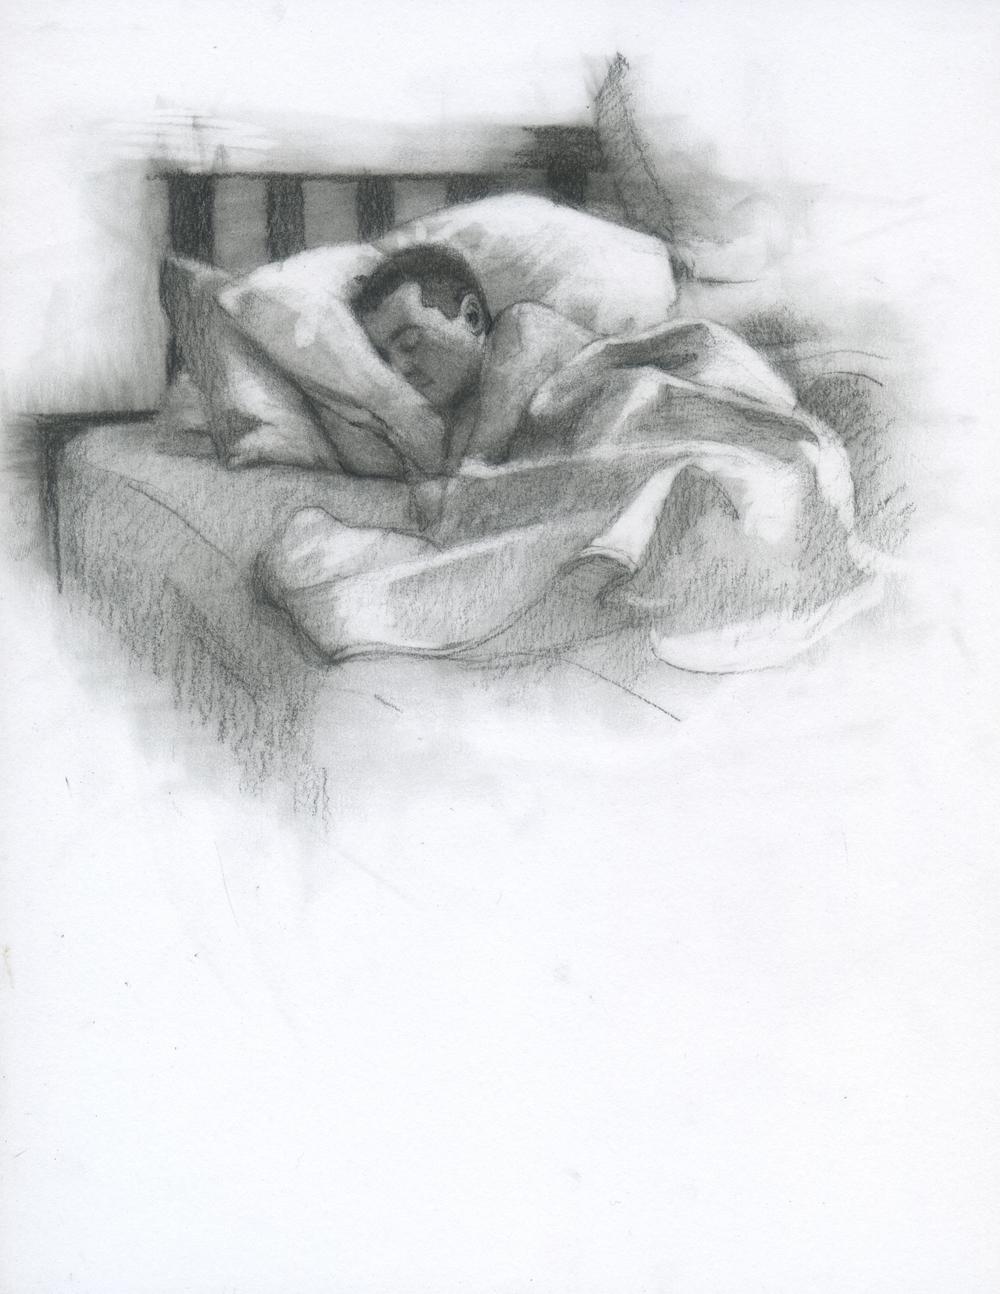 "Sleeping, charcoal on paper, 11"" x 8.5"", 2014"